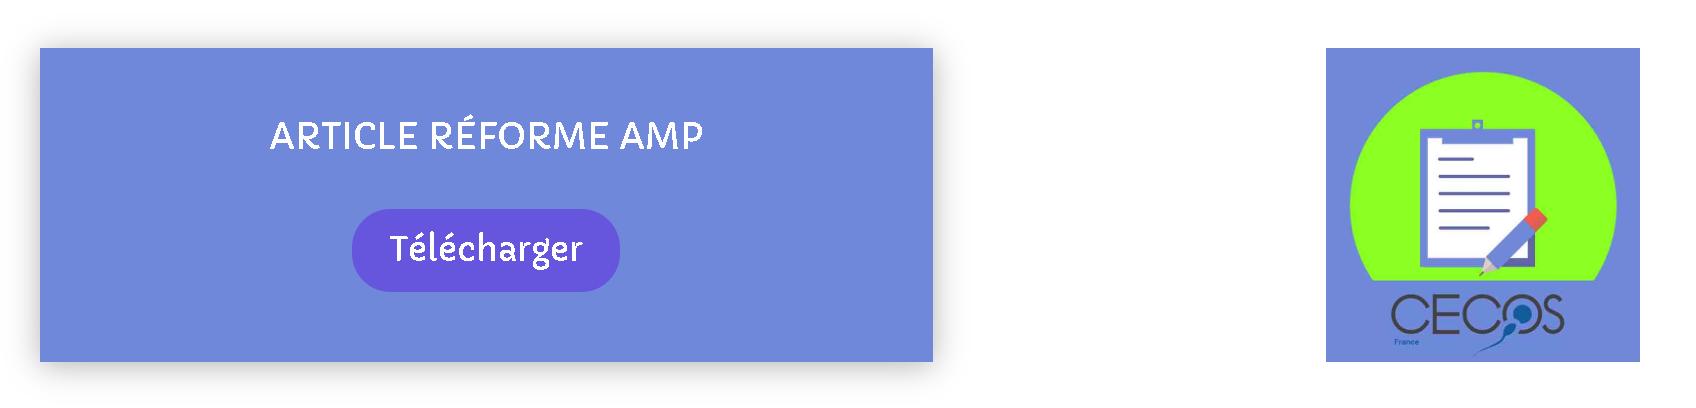 Gros plan sur document AMP